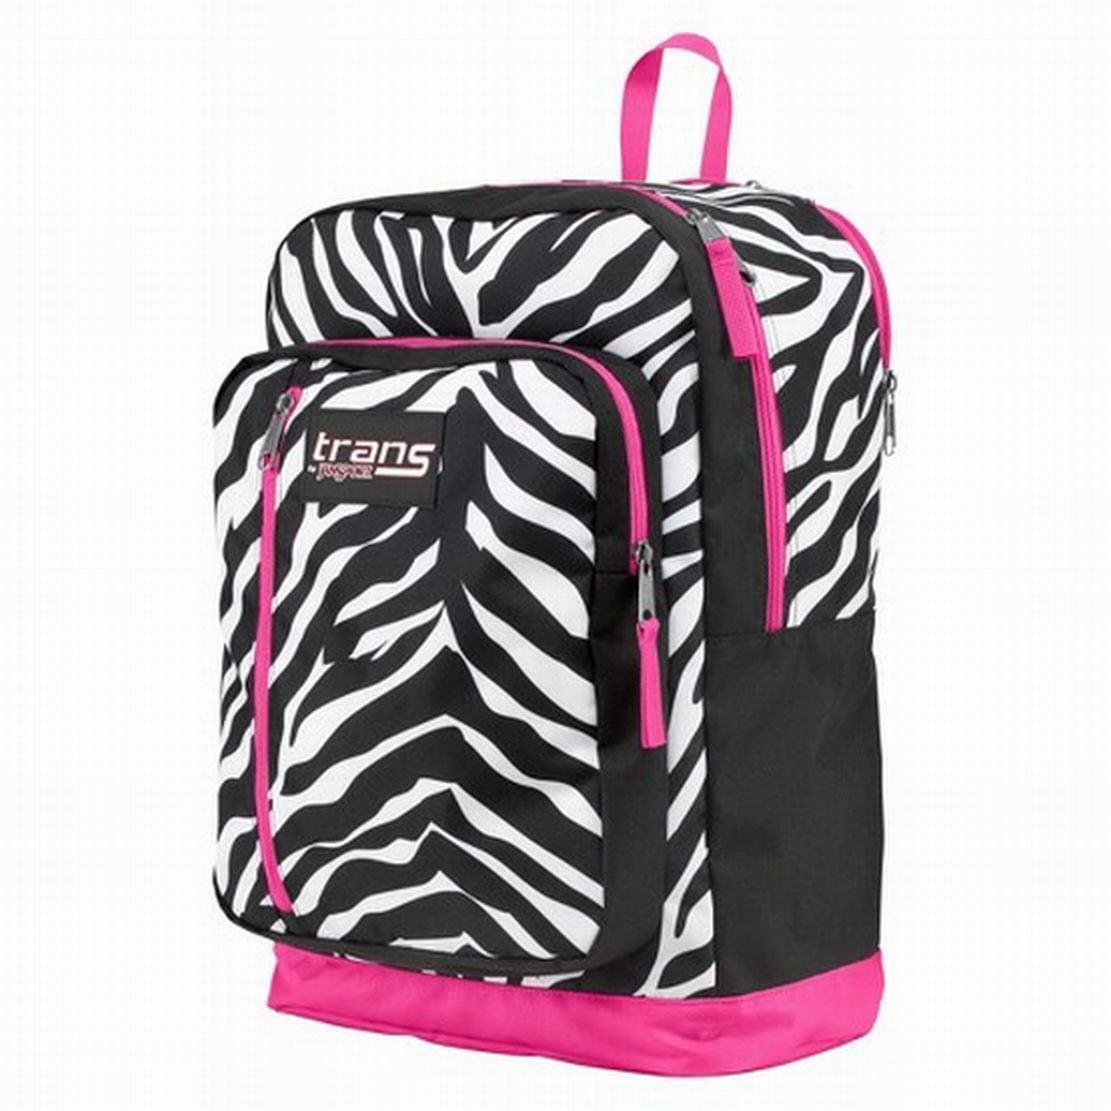 Trans by Jansport Overexposed Megahertz Backpack Zebra Pattern ...